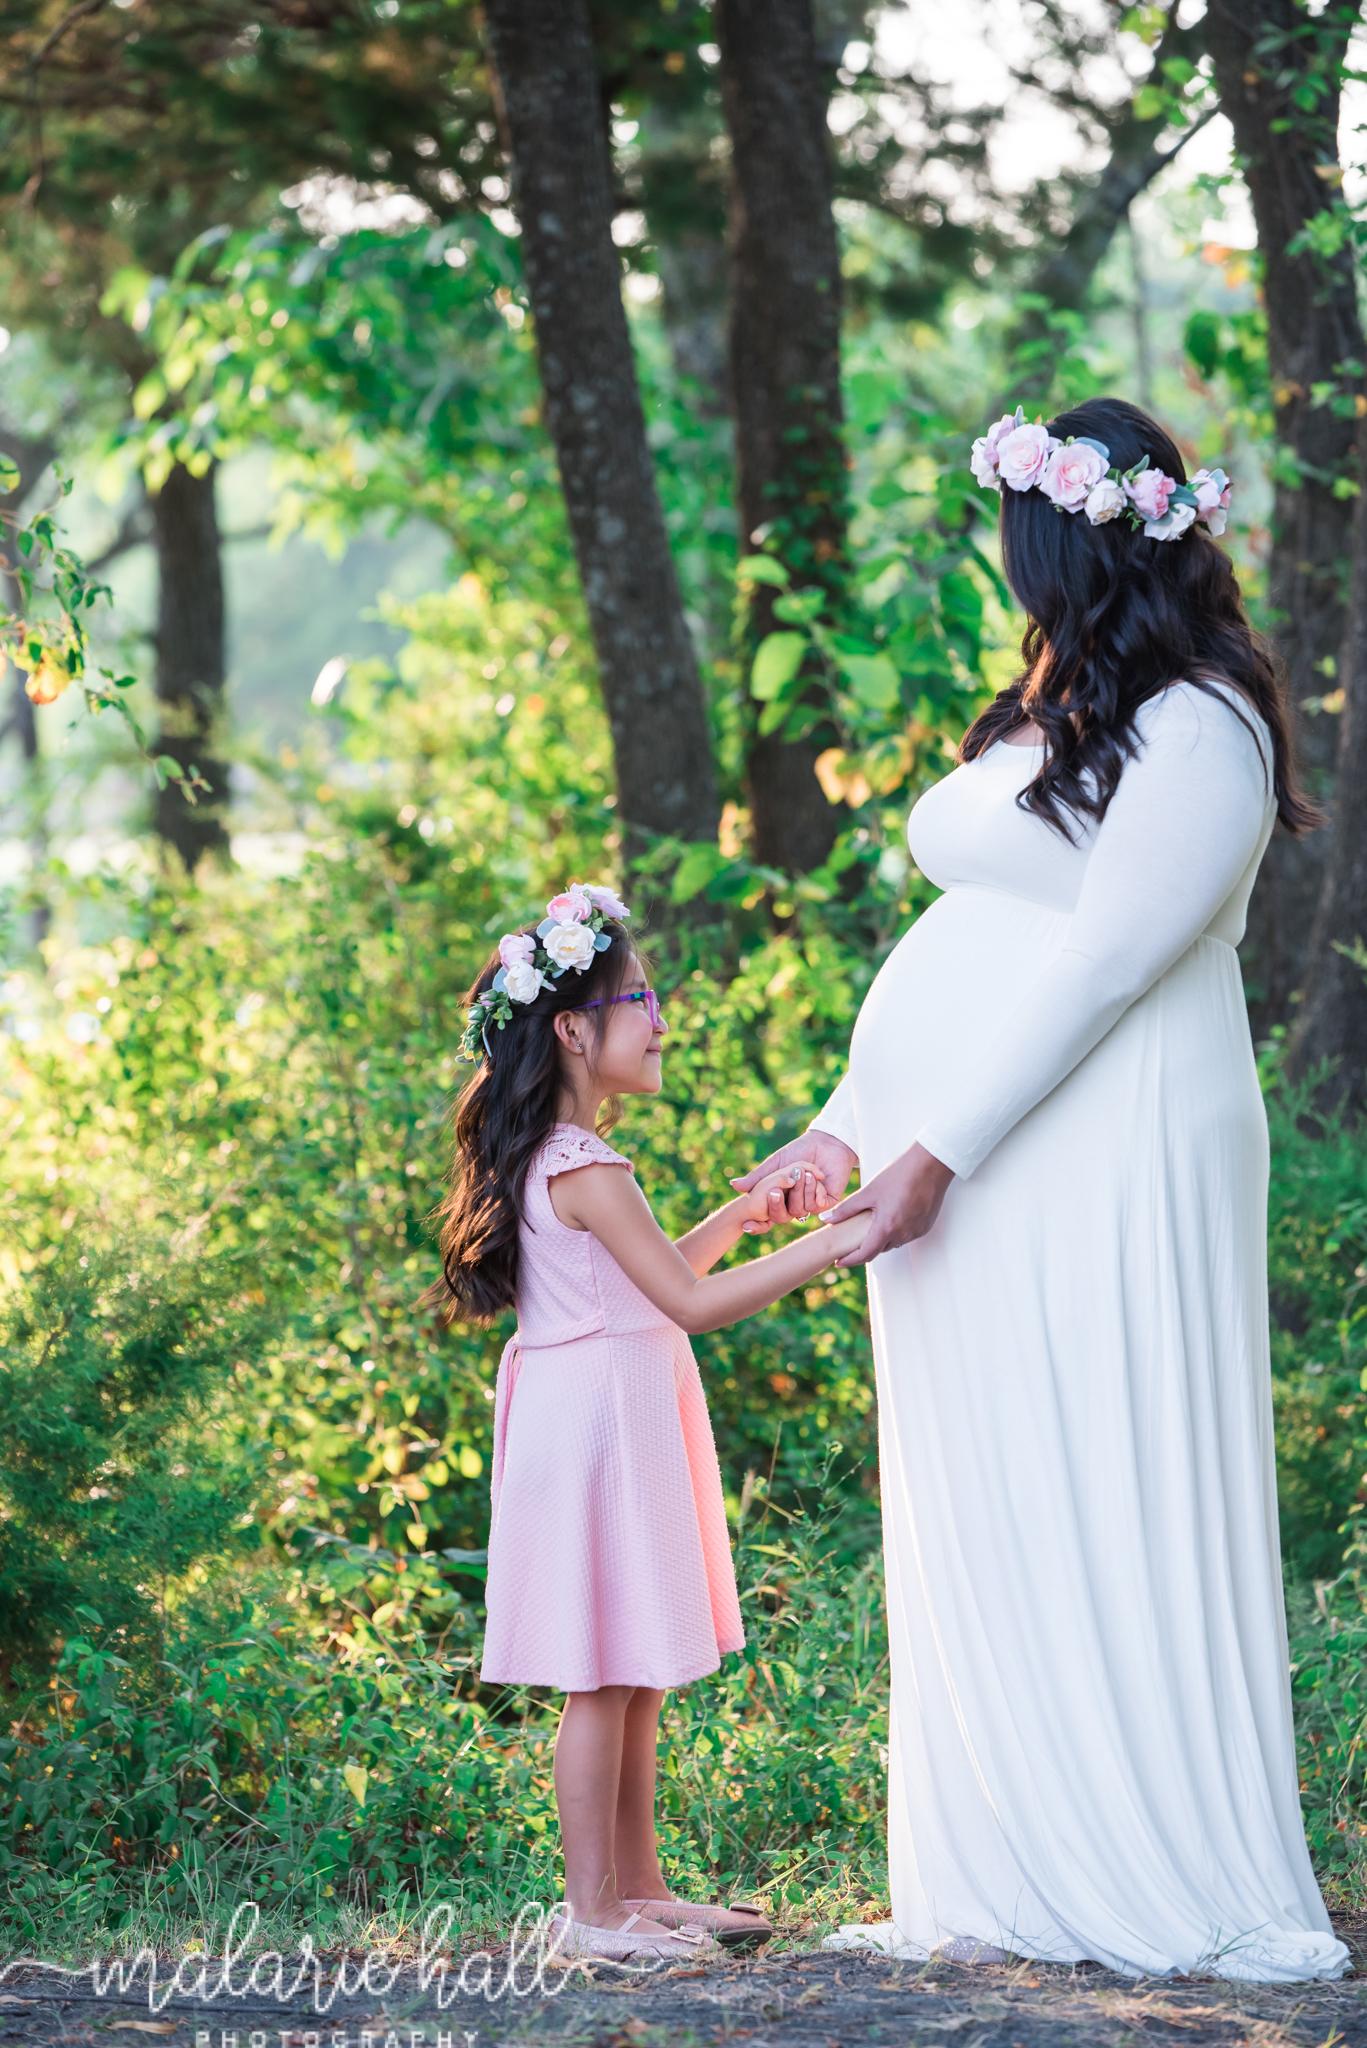 suarez maternity-9717.jpg